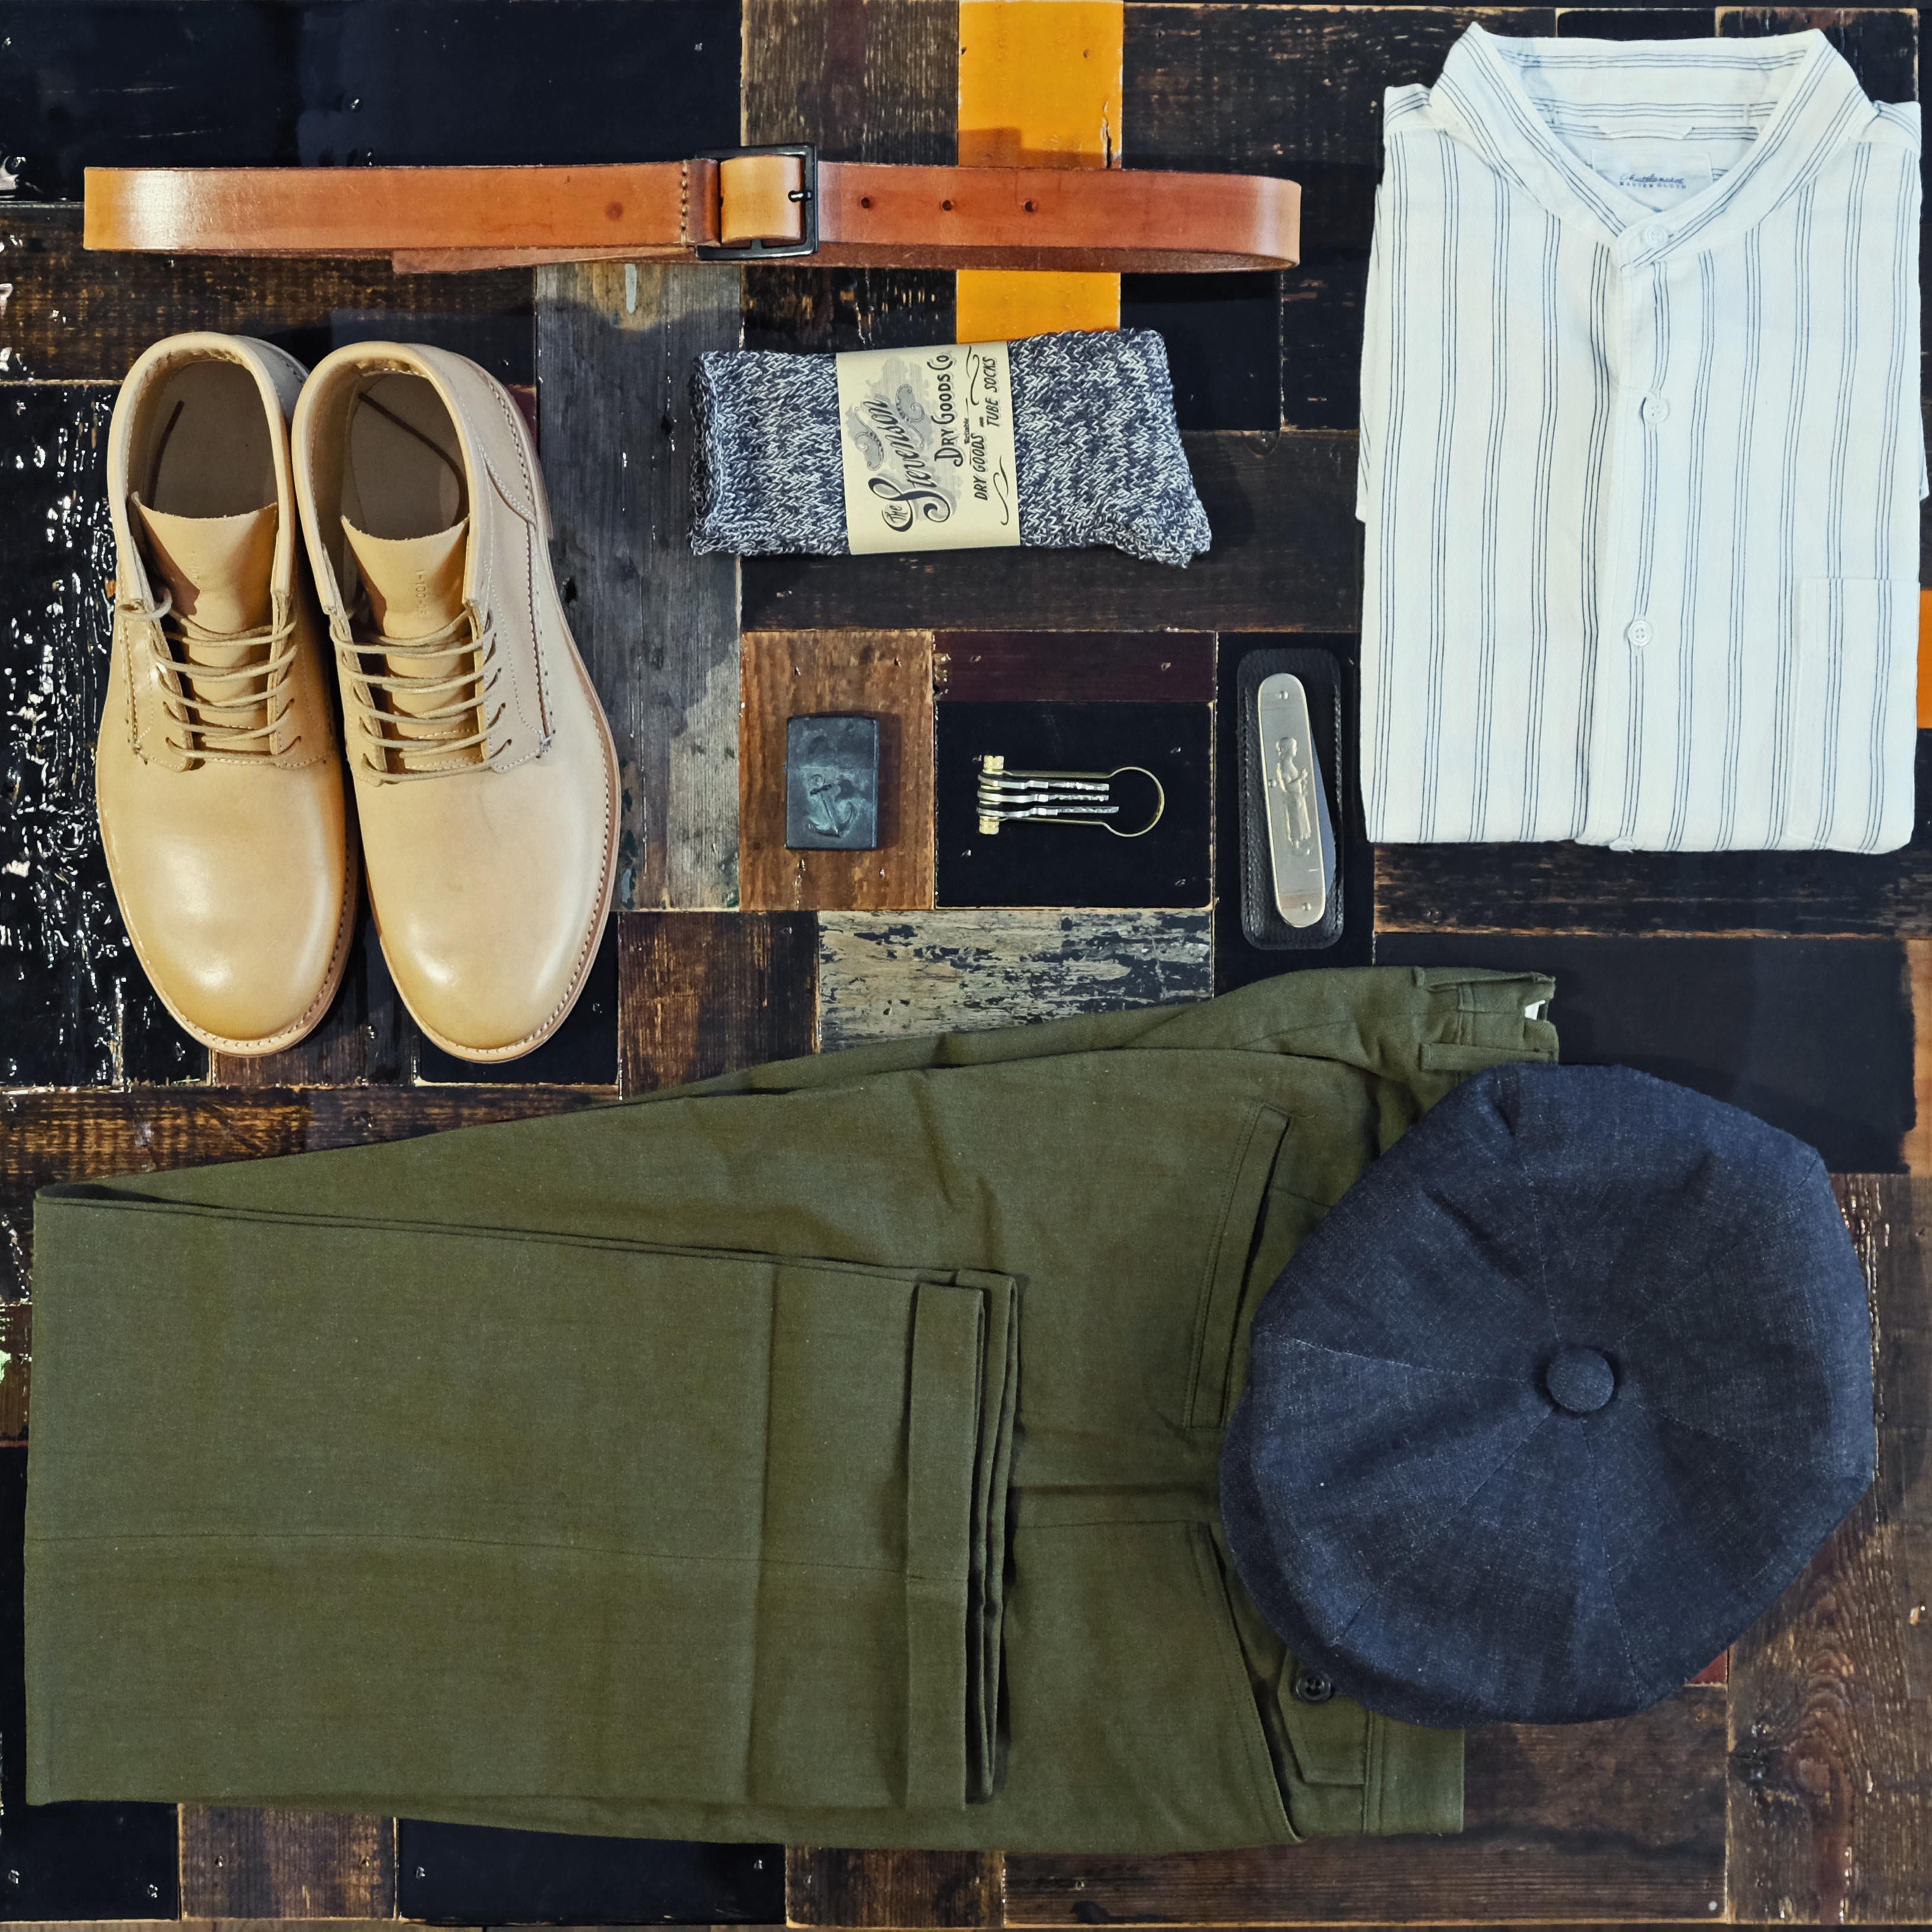 outfit-der-woche-shuttlenotes-buttsandshoulders-accessoires-vintage-stevensonoverall